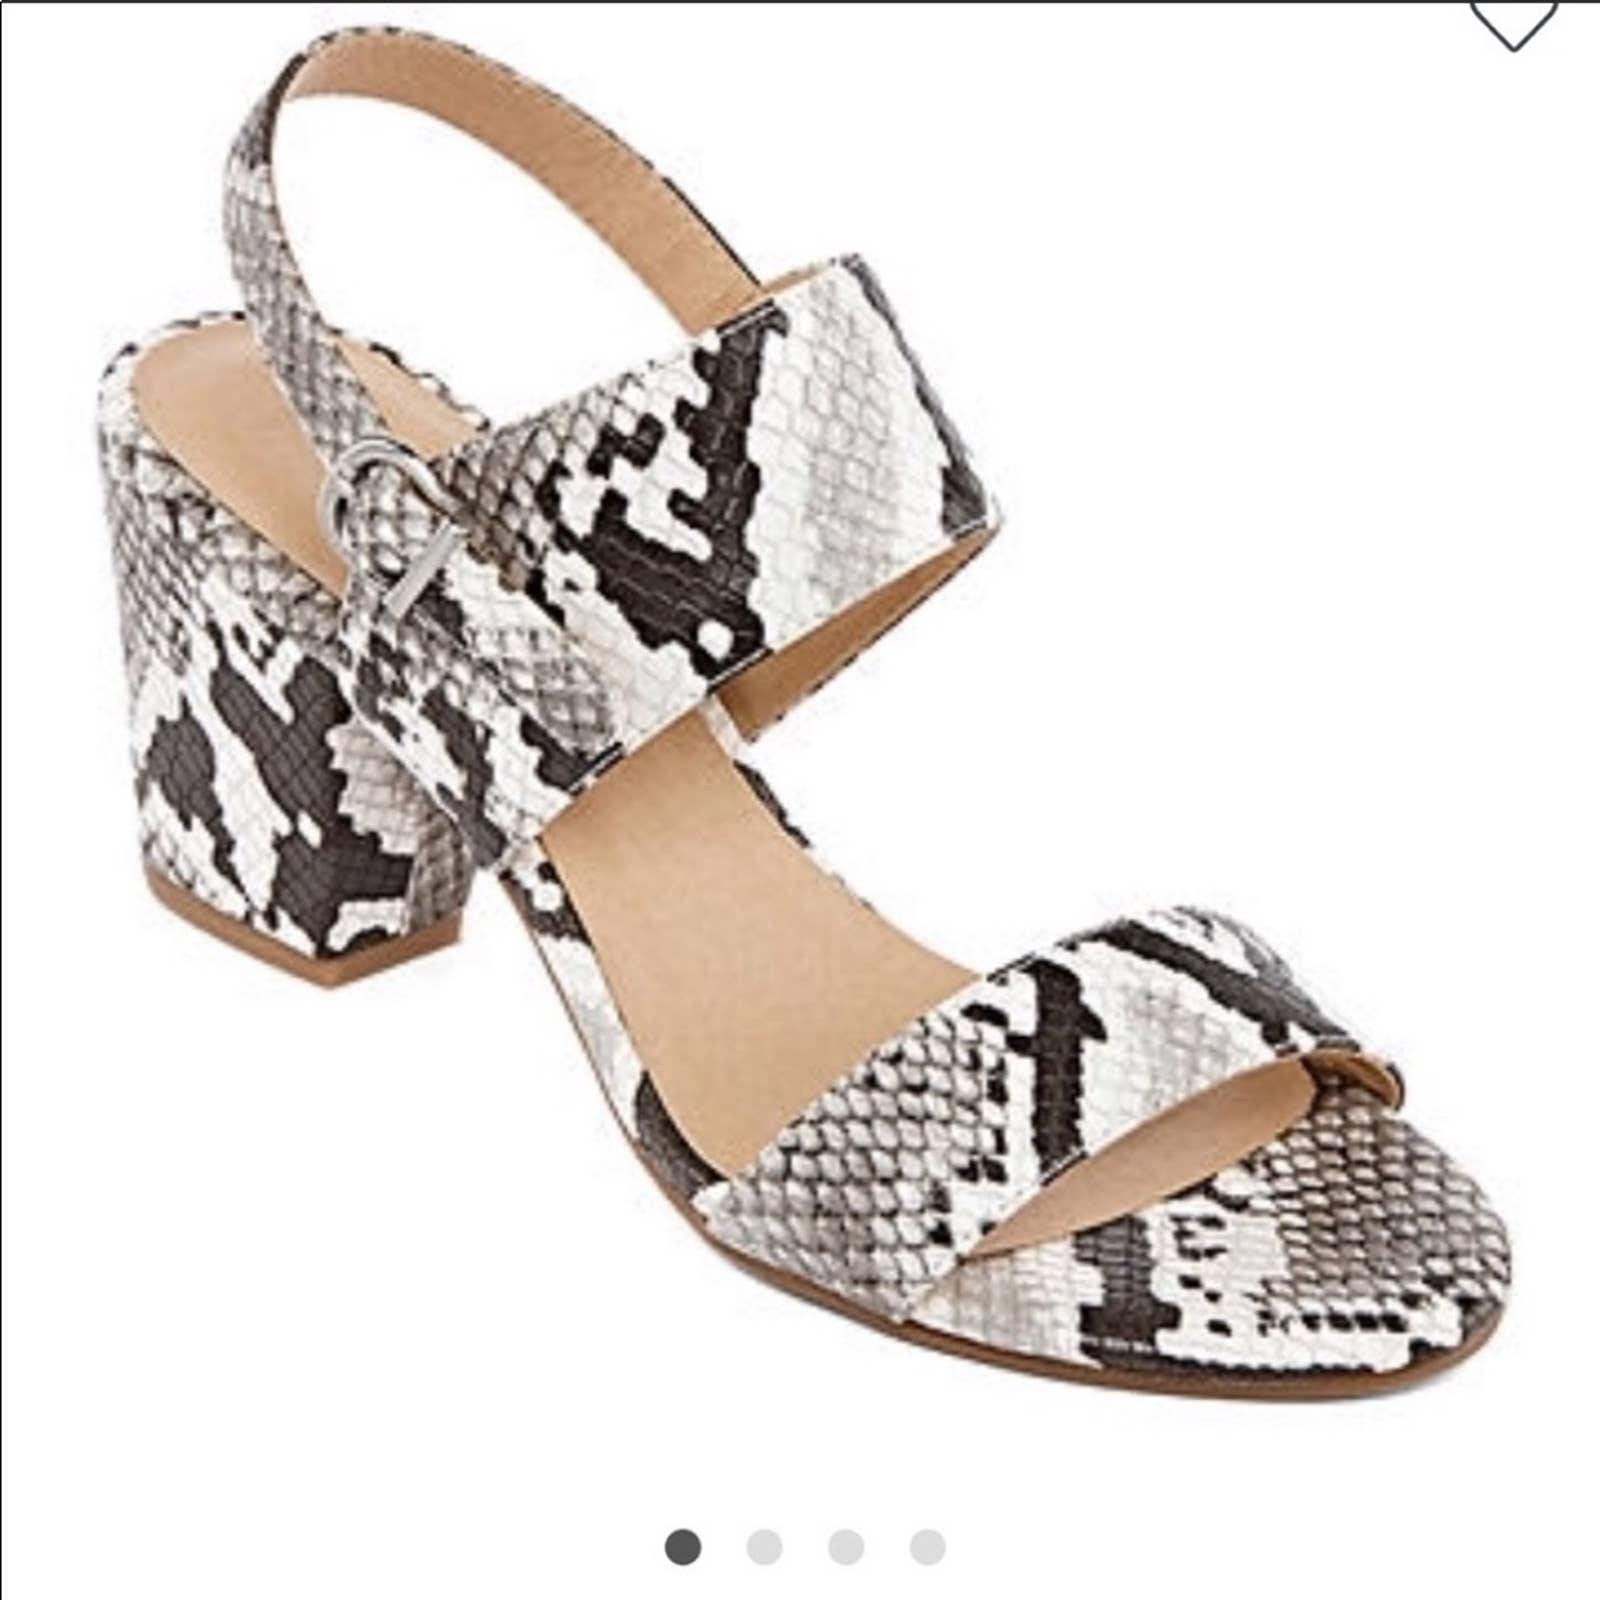 Chinese Laundry snakeskin heels 7 1/2